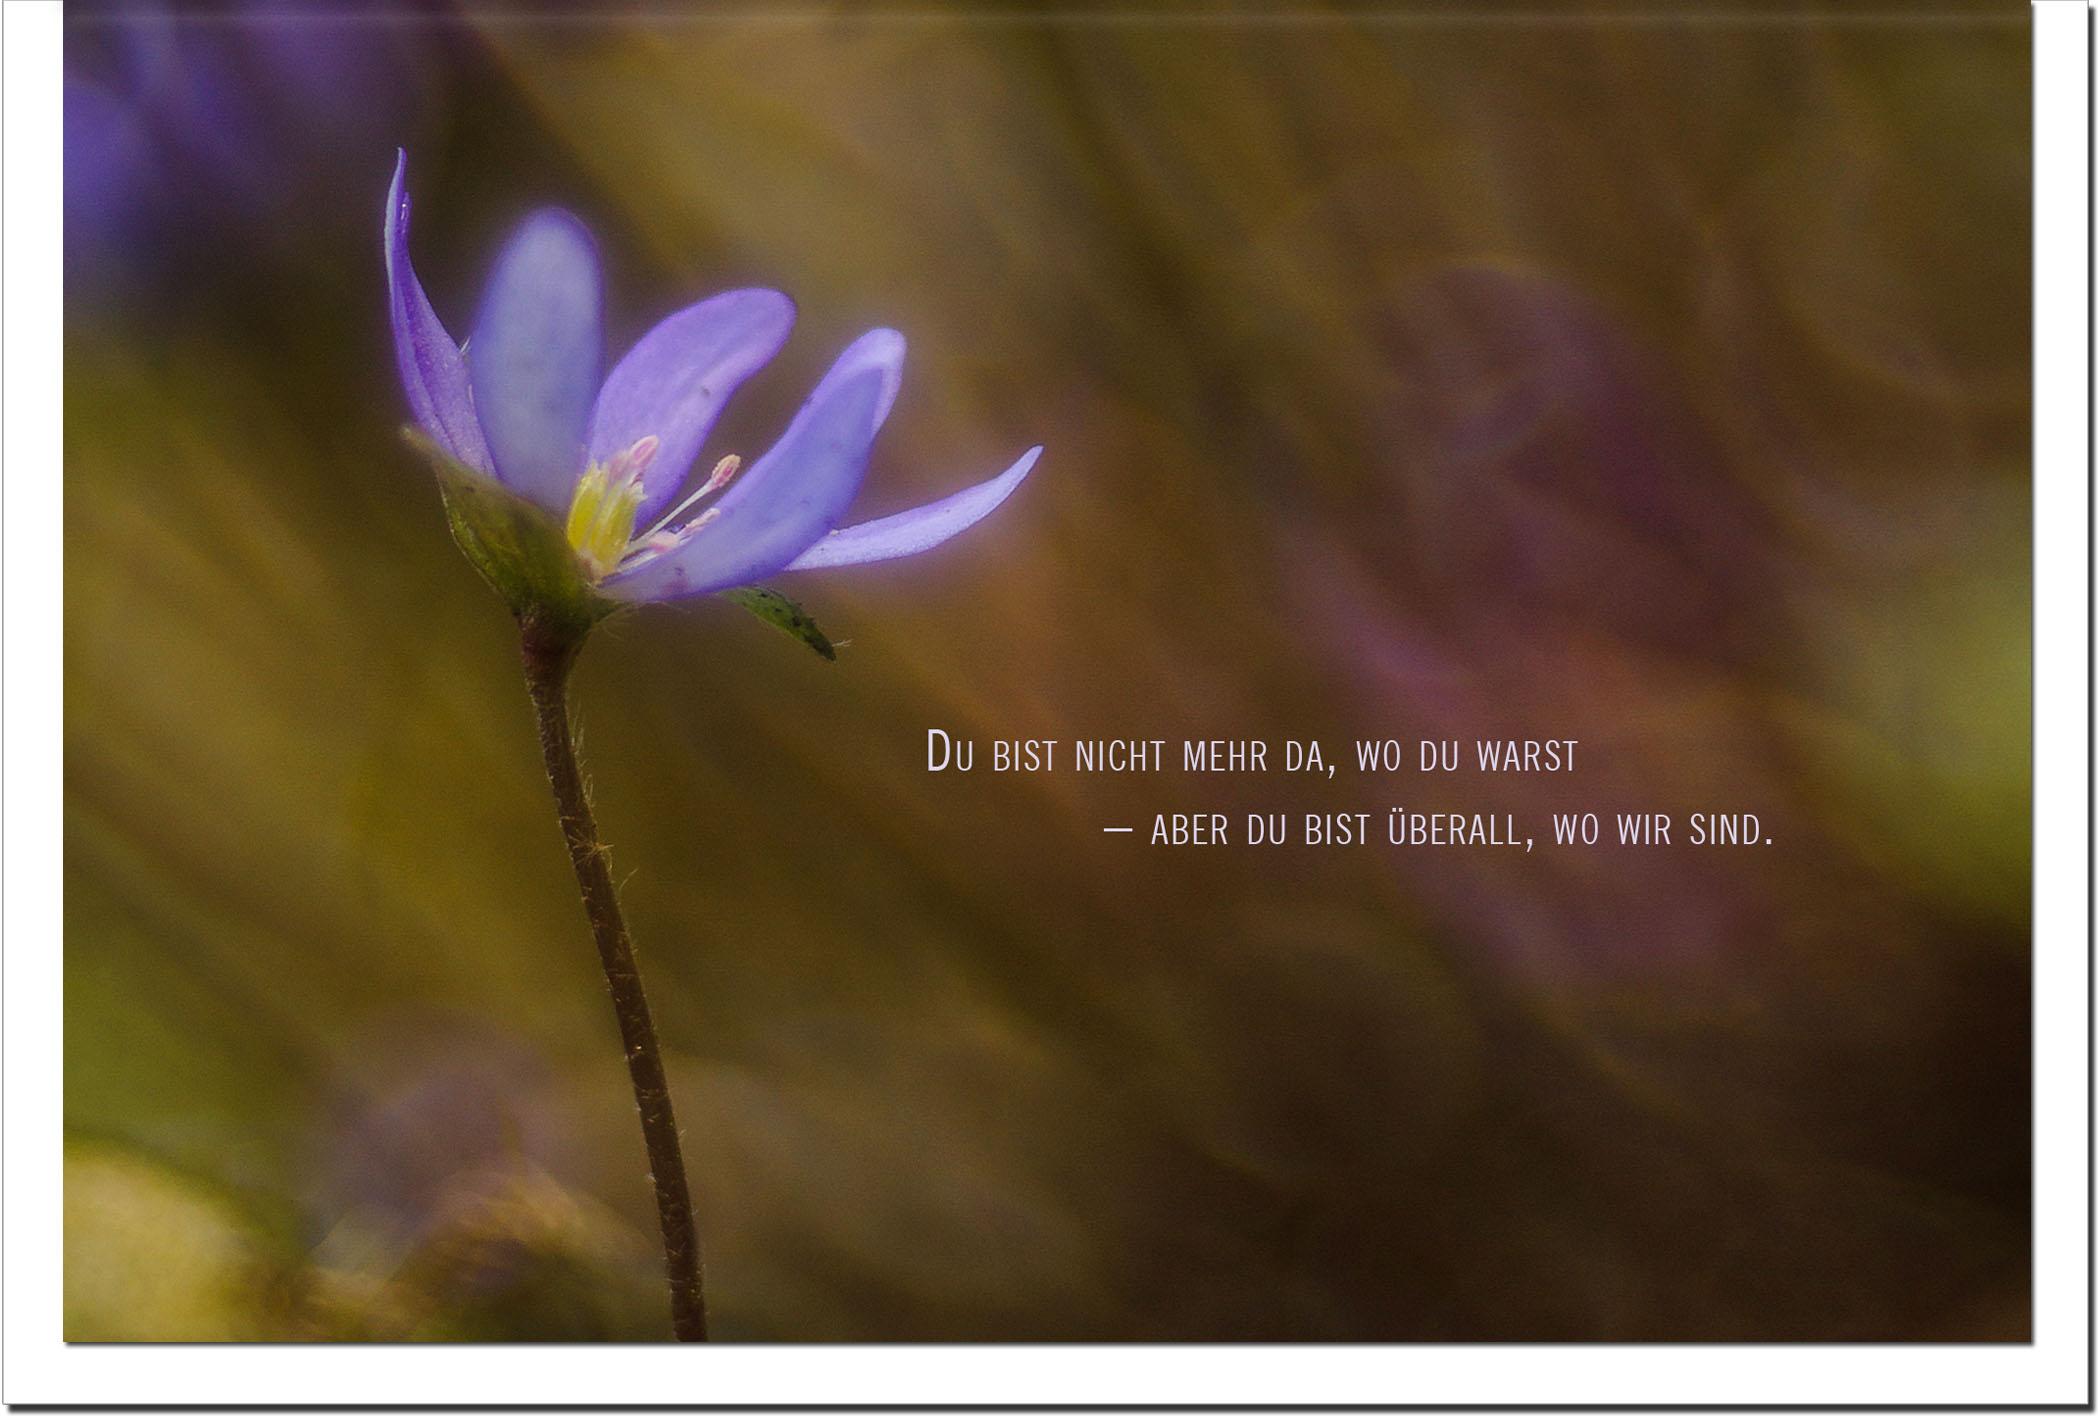 Trauer Trauerkarten Kondolenzkarten / Blaue Blume / Stilvoll Niveauvoll Einfühlsam